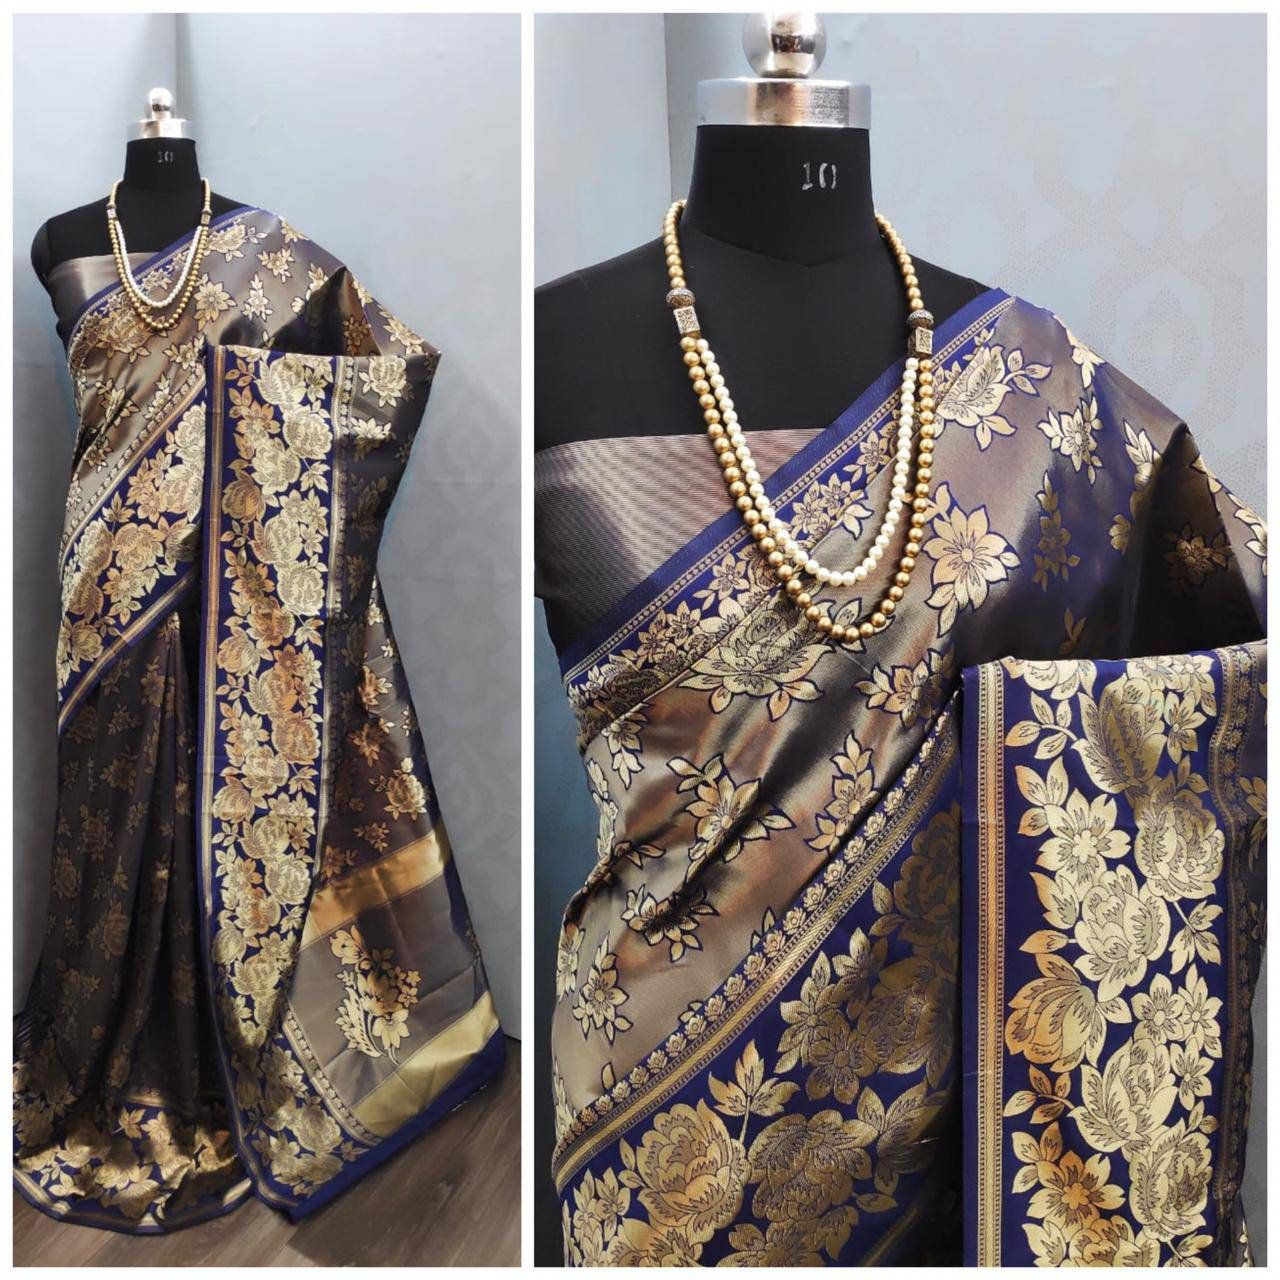 Beautiful pallu Zari all over body with peacock boxes n annam rangoli in border